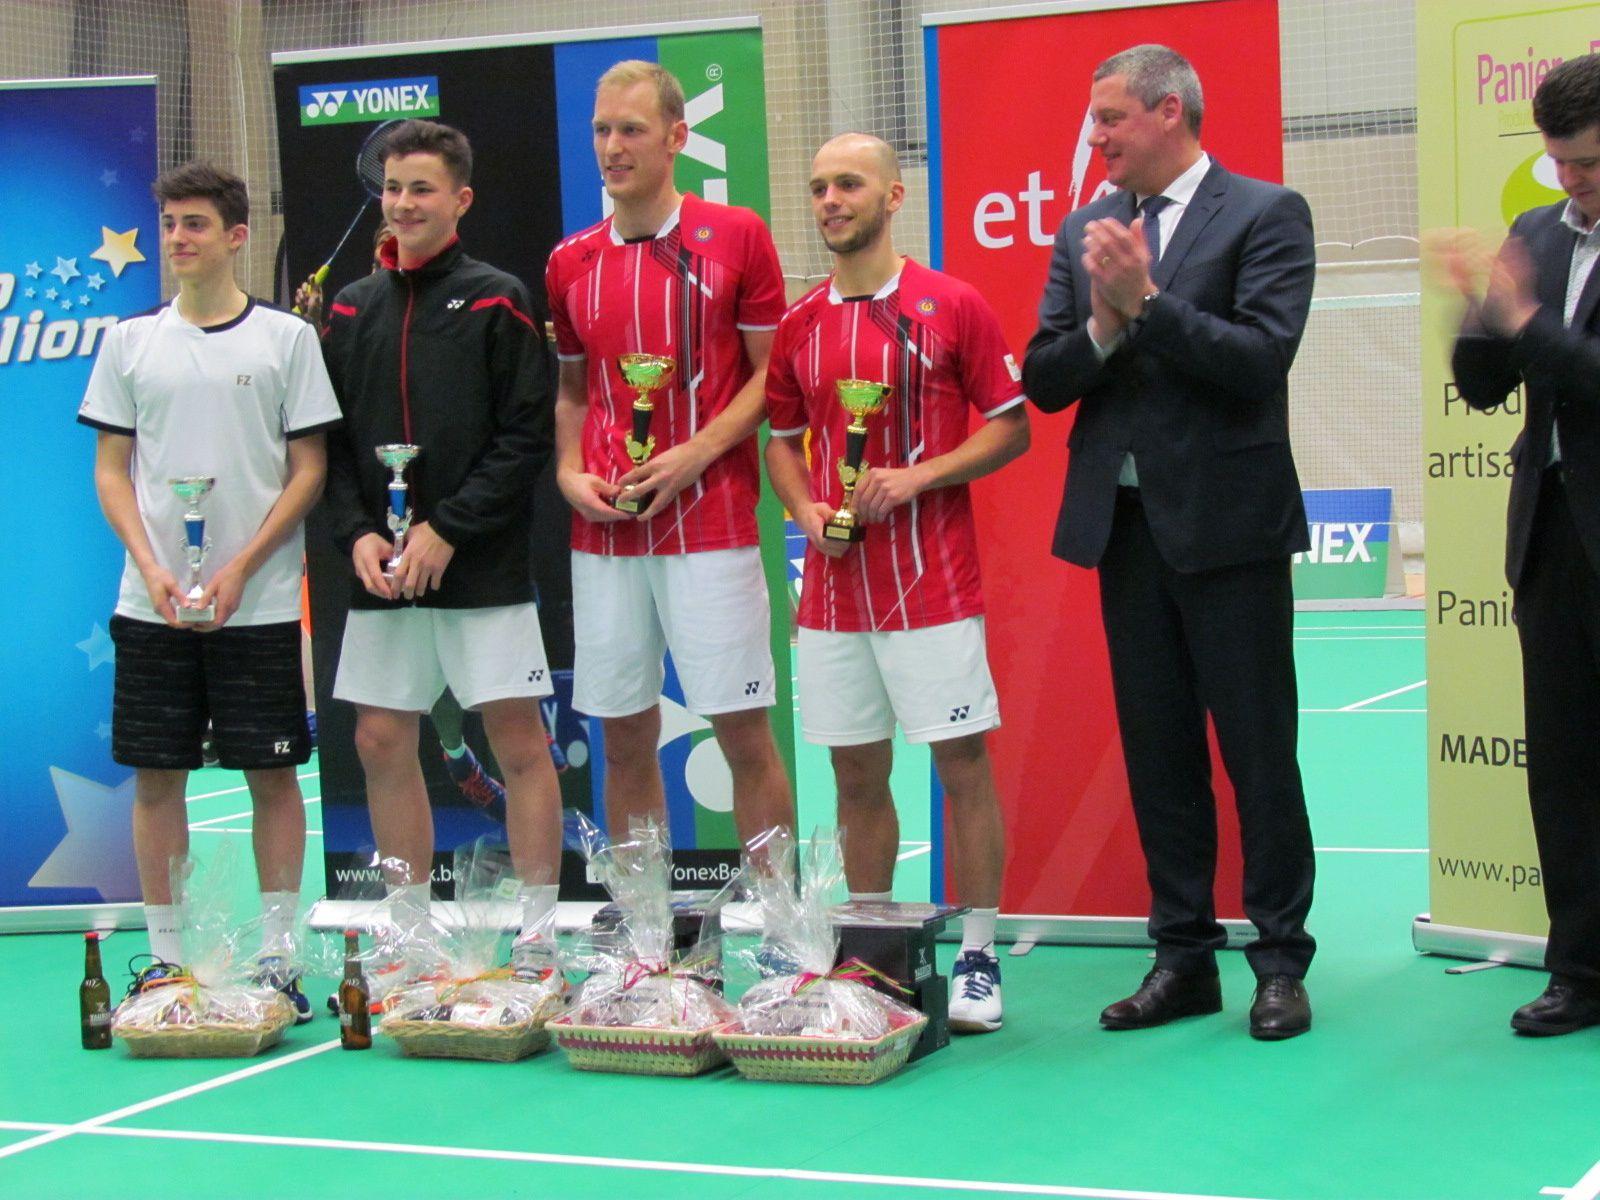 Championnats de badminton Elites 2017